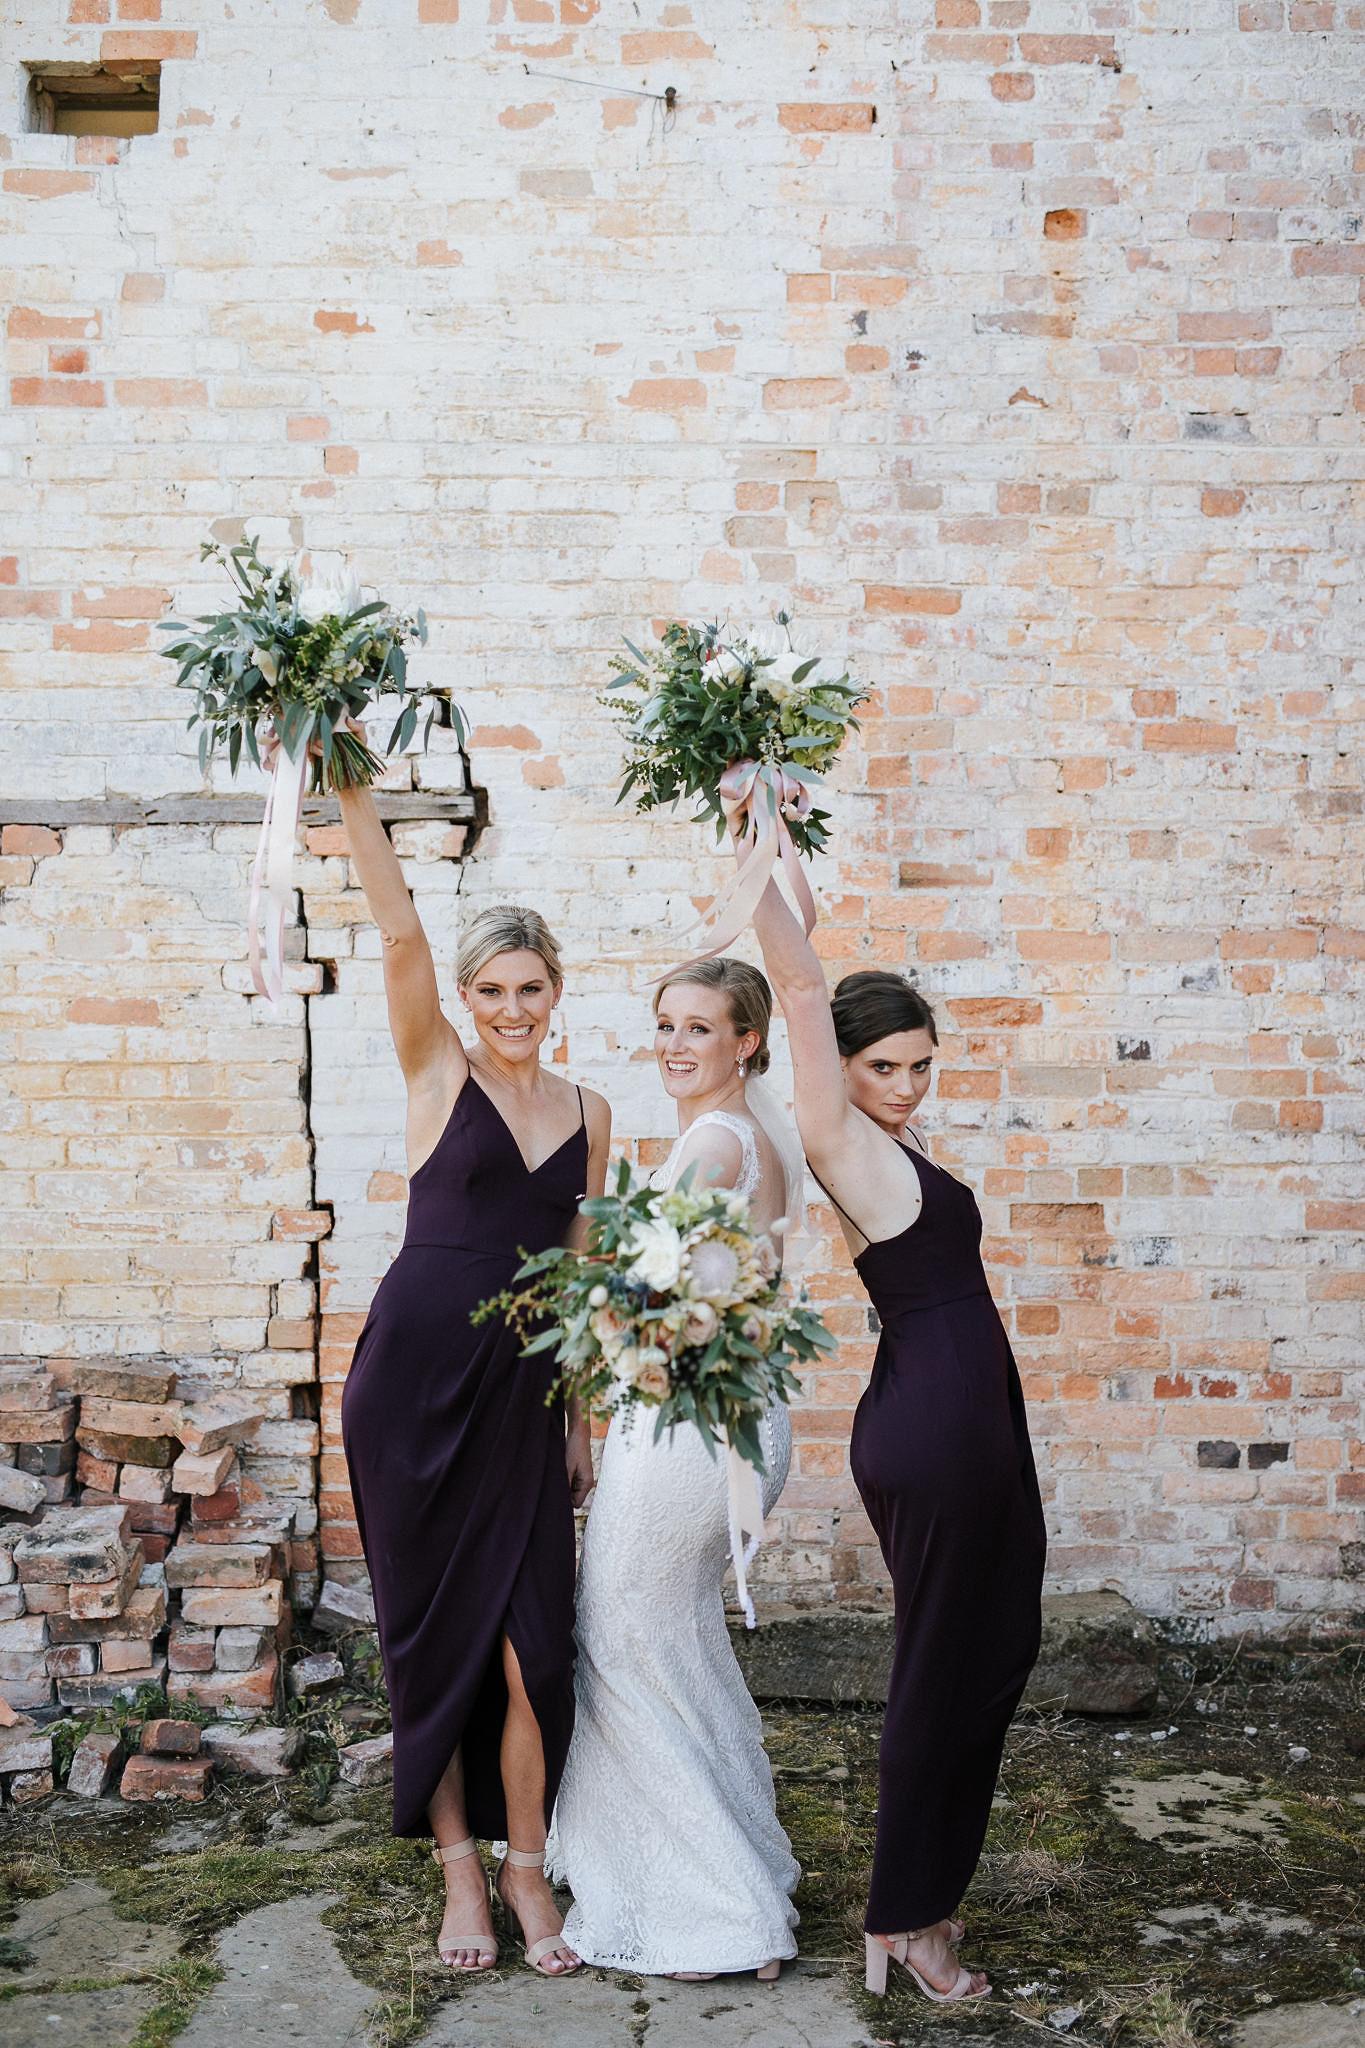 NinaHamilton-TasmanianWeddingPhotographer-Chloe+Nick-OldFarmPortArthur-ShareMe-425.jpg